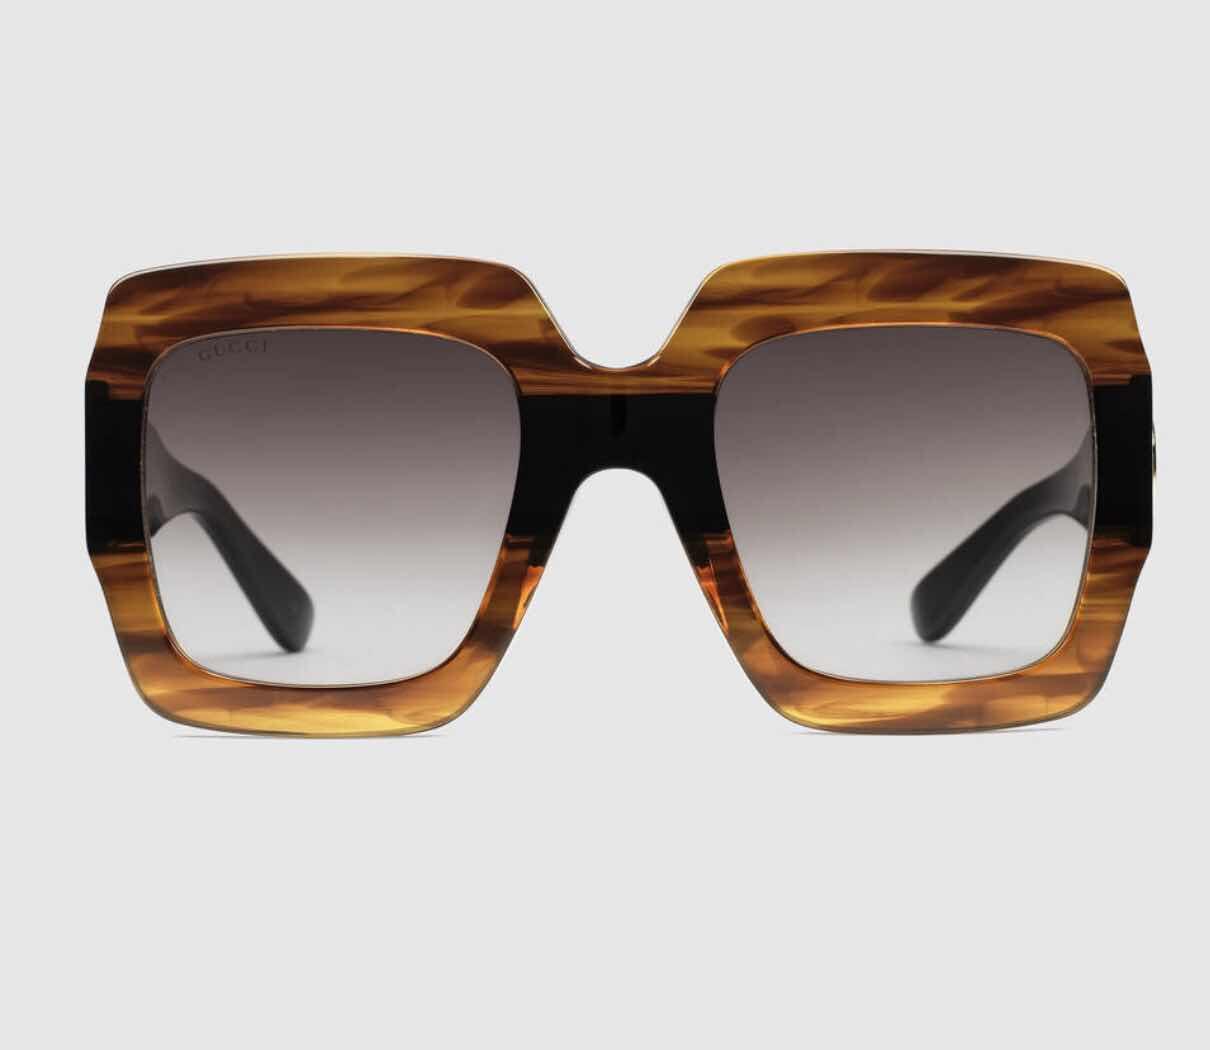 Gucci gorgeous sunglasses